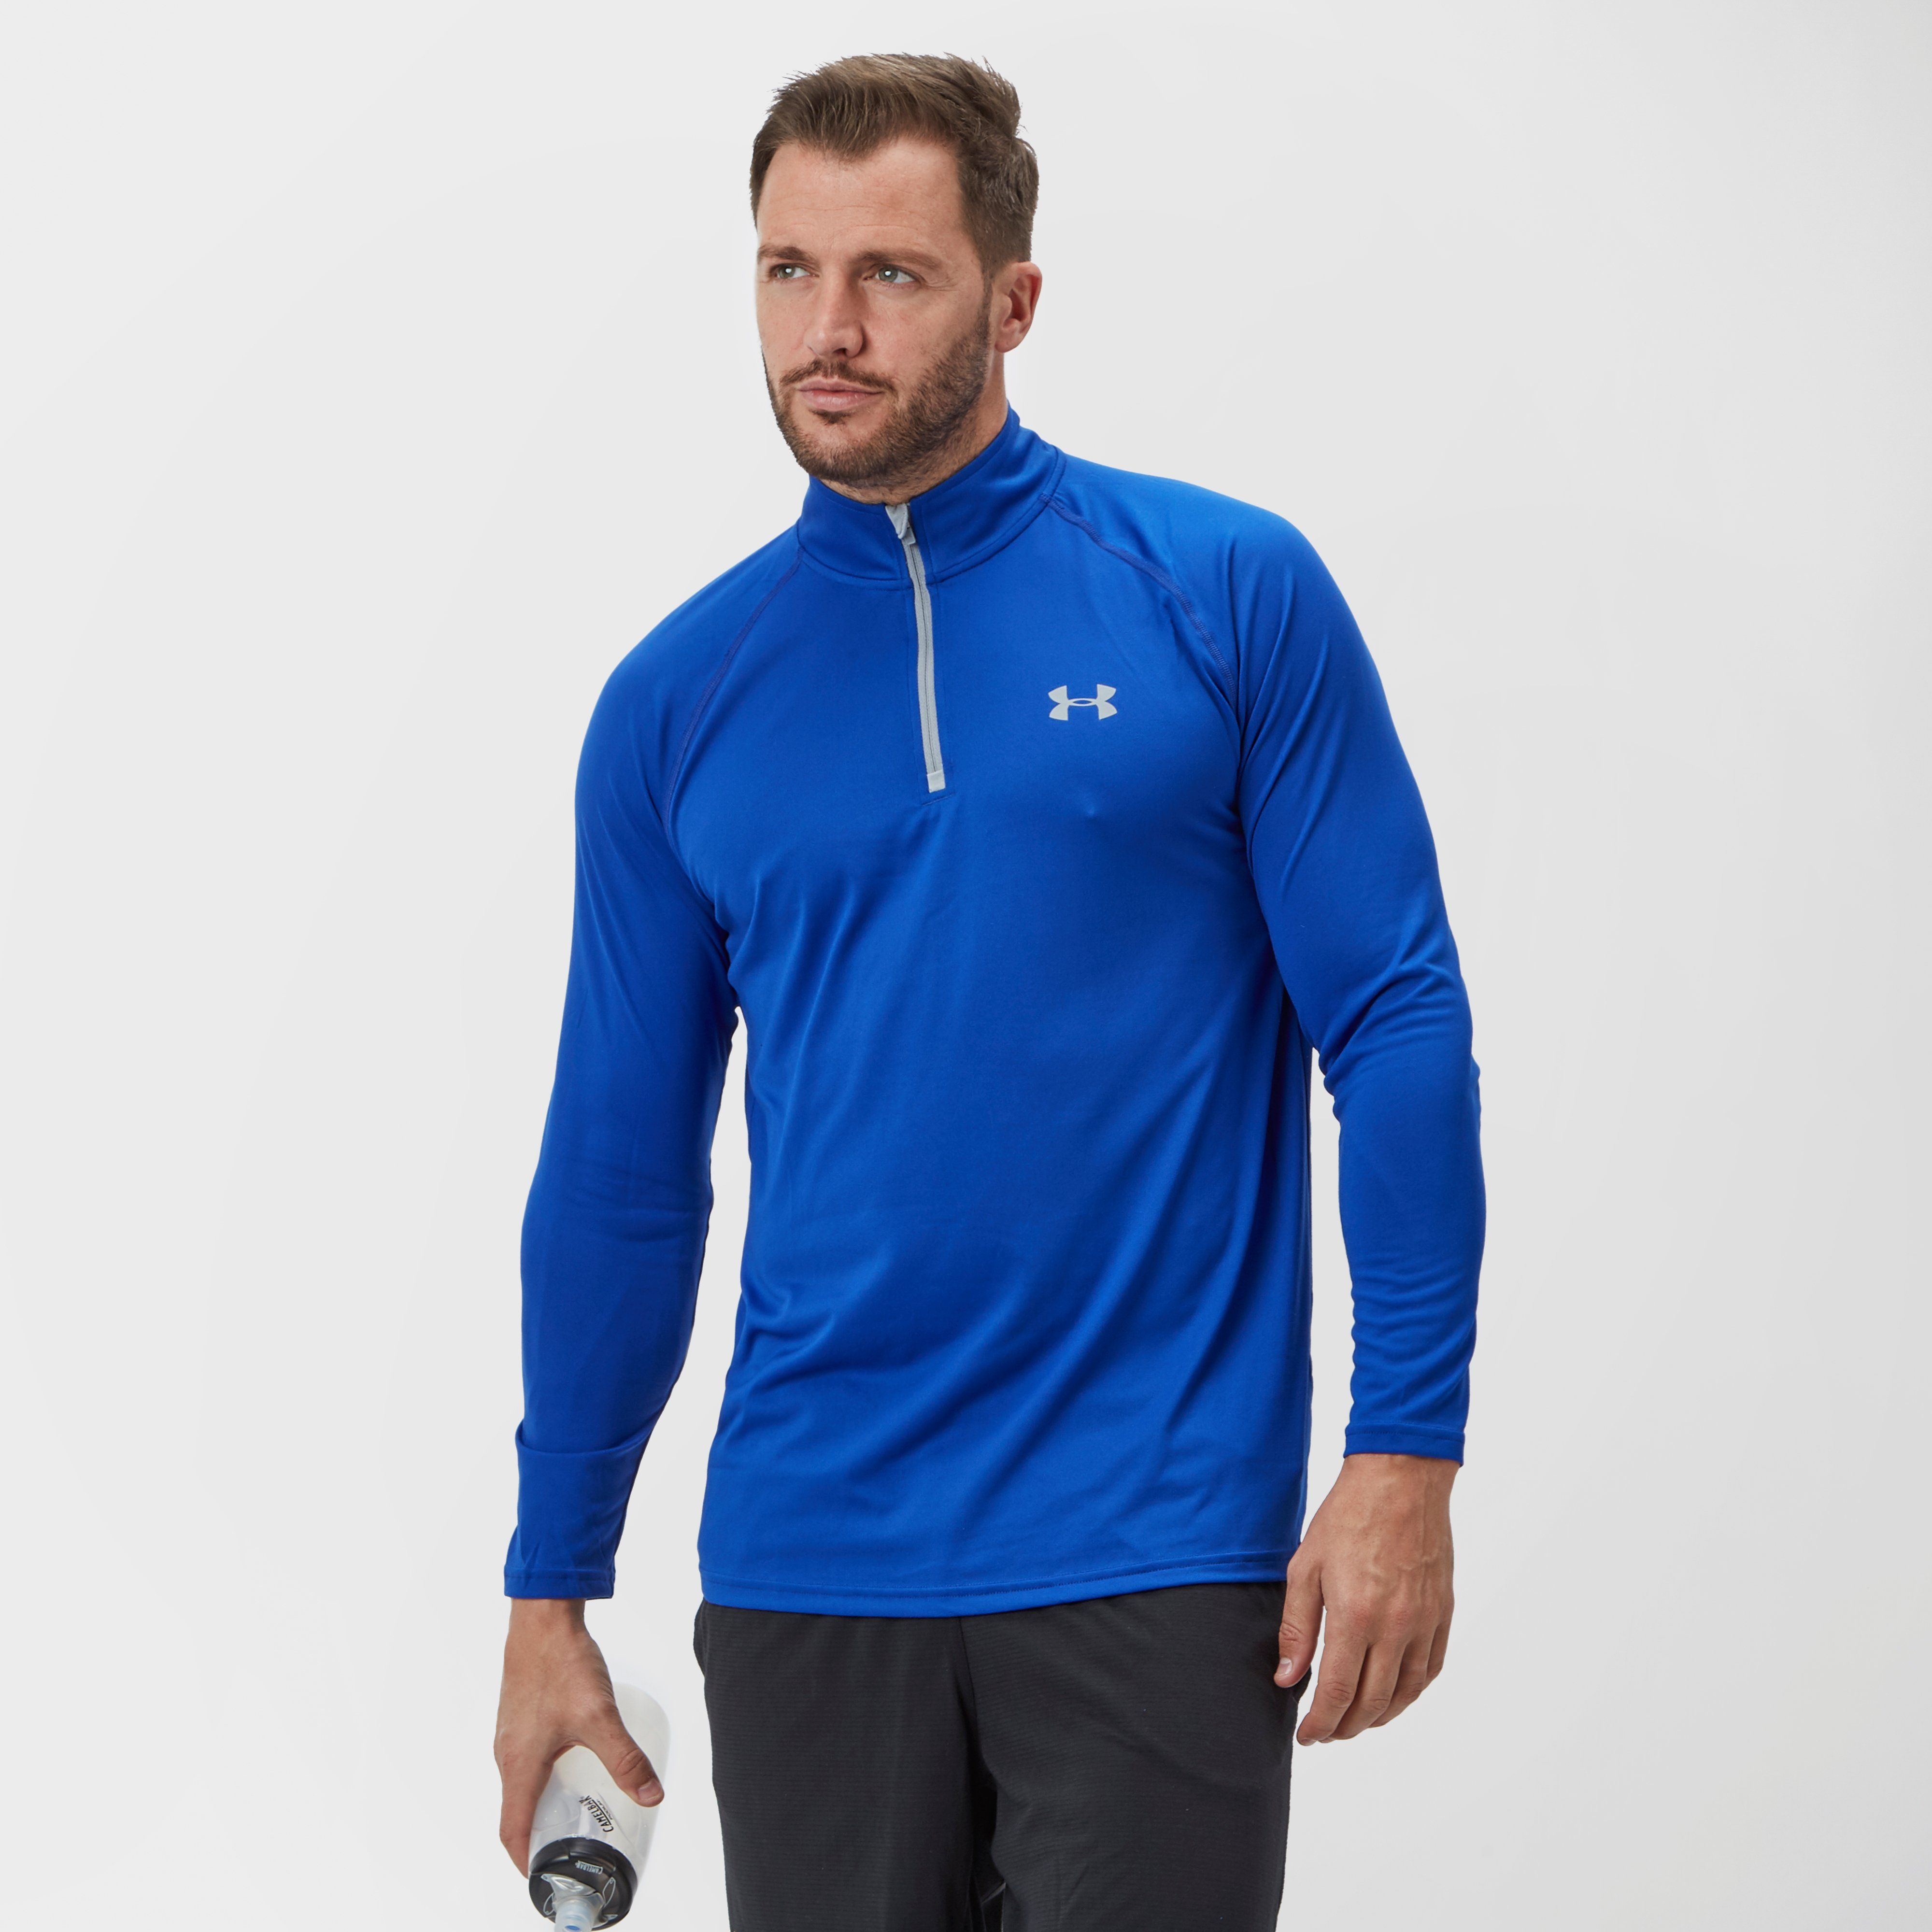 UNDER ARMOUR Men's Tech™ Quarter-Zip Fleece